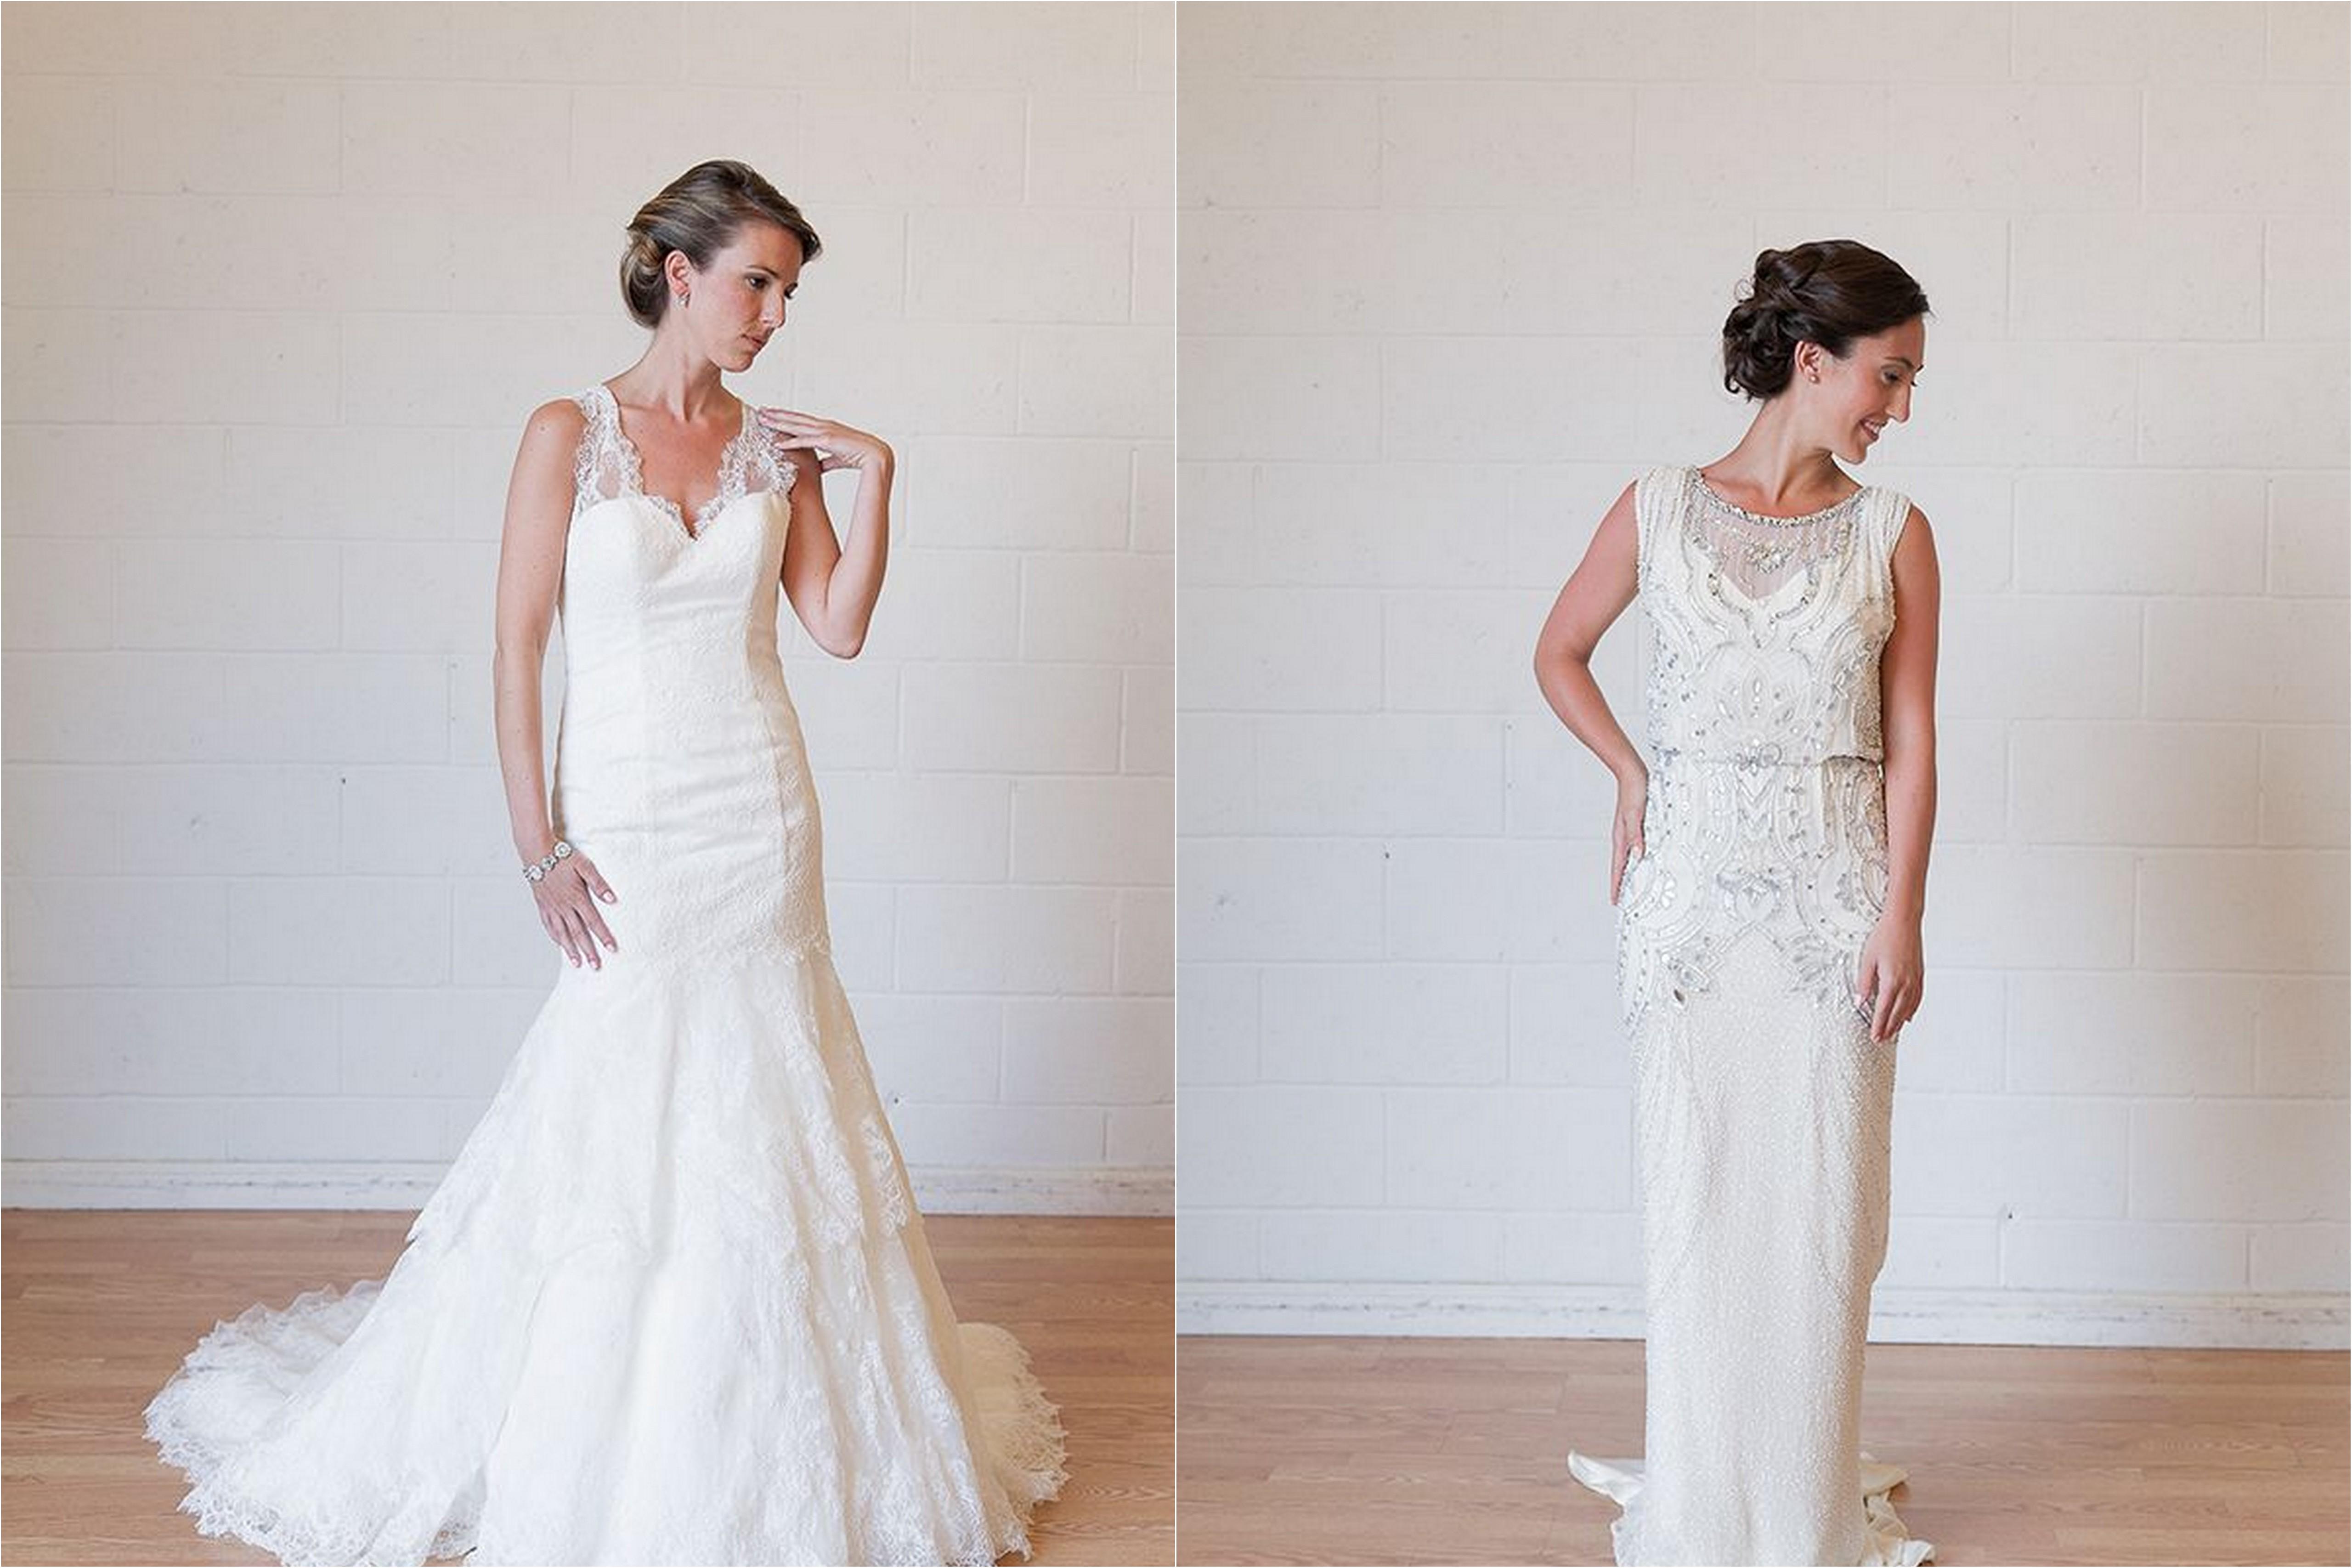 top 4 sites to rent from b rent a wedding dress 08 18 BorrowingMagnolia